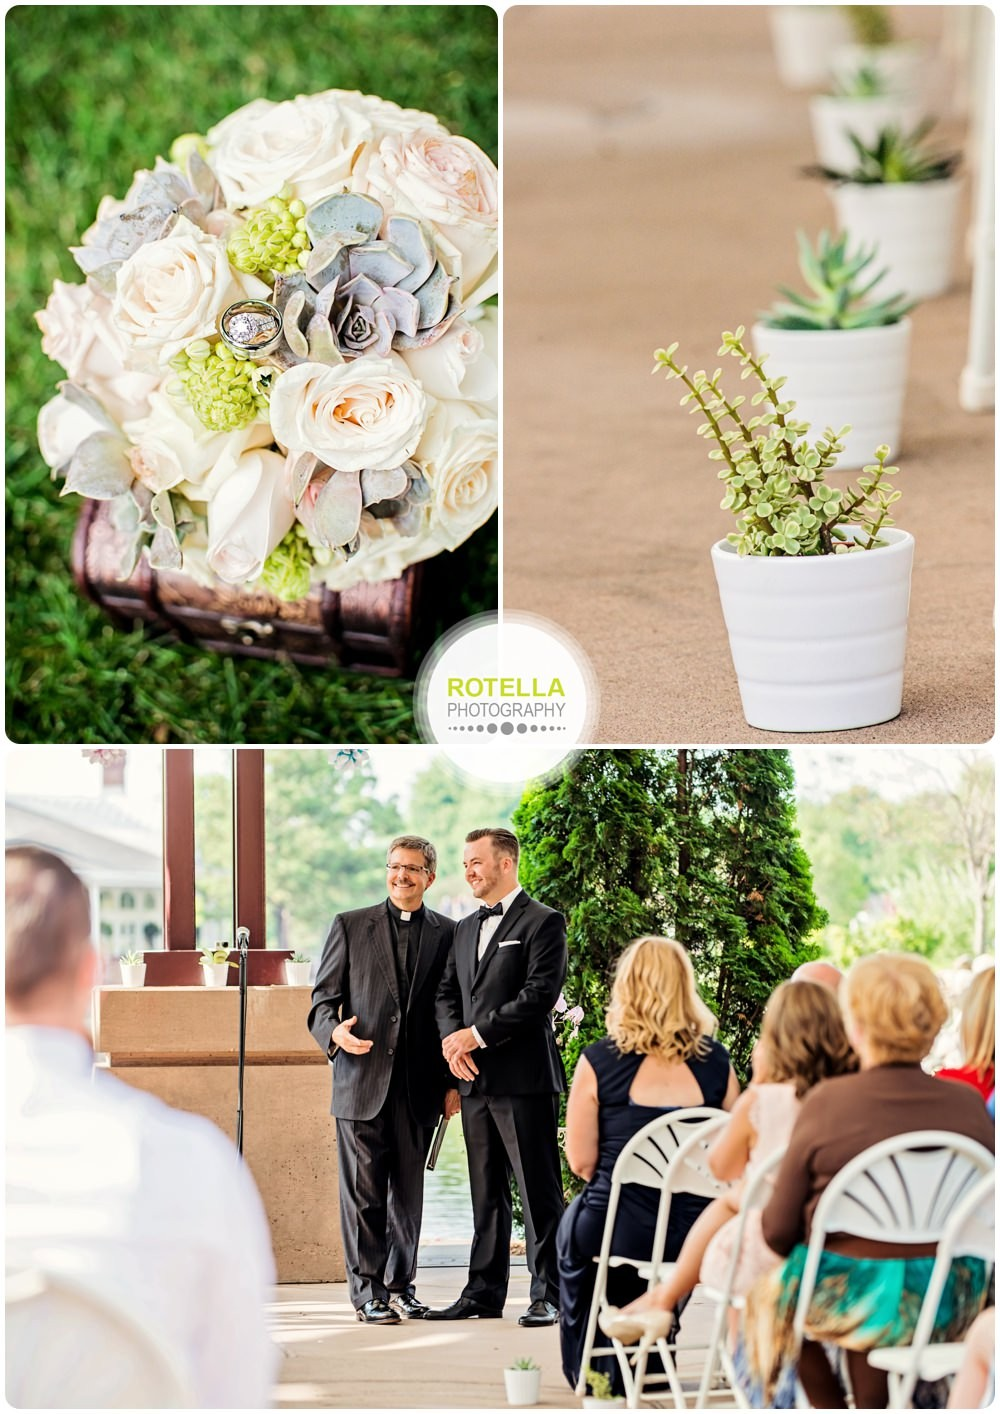 MELANIE-DEREK-MINNESOTA-WEDDING-PHOTOGRAPHY-ROTELLA-PHOTOGRAPHY_2015-08